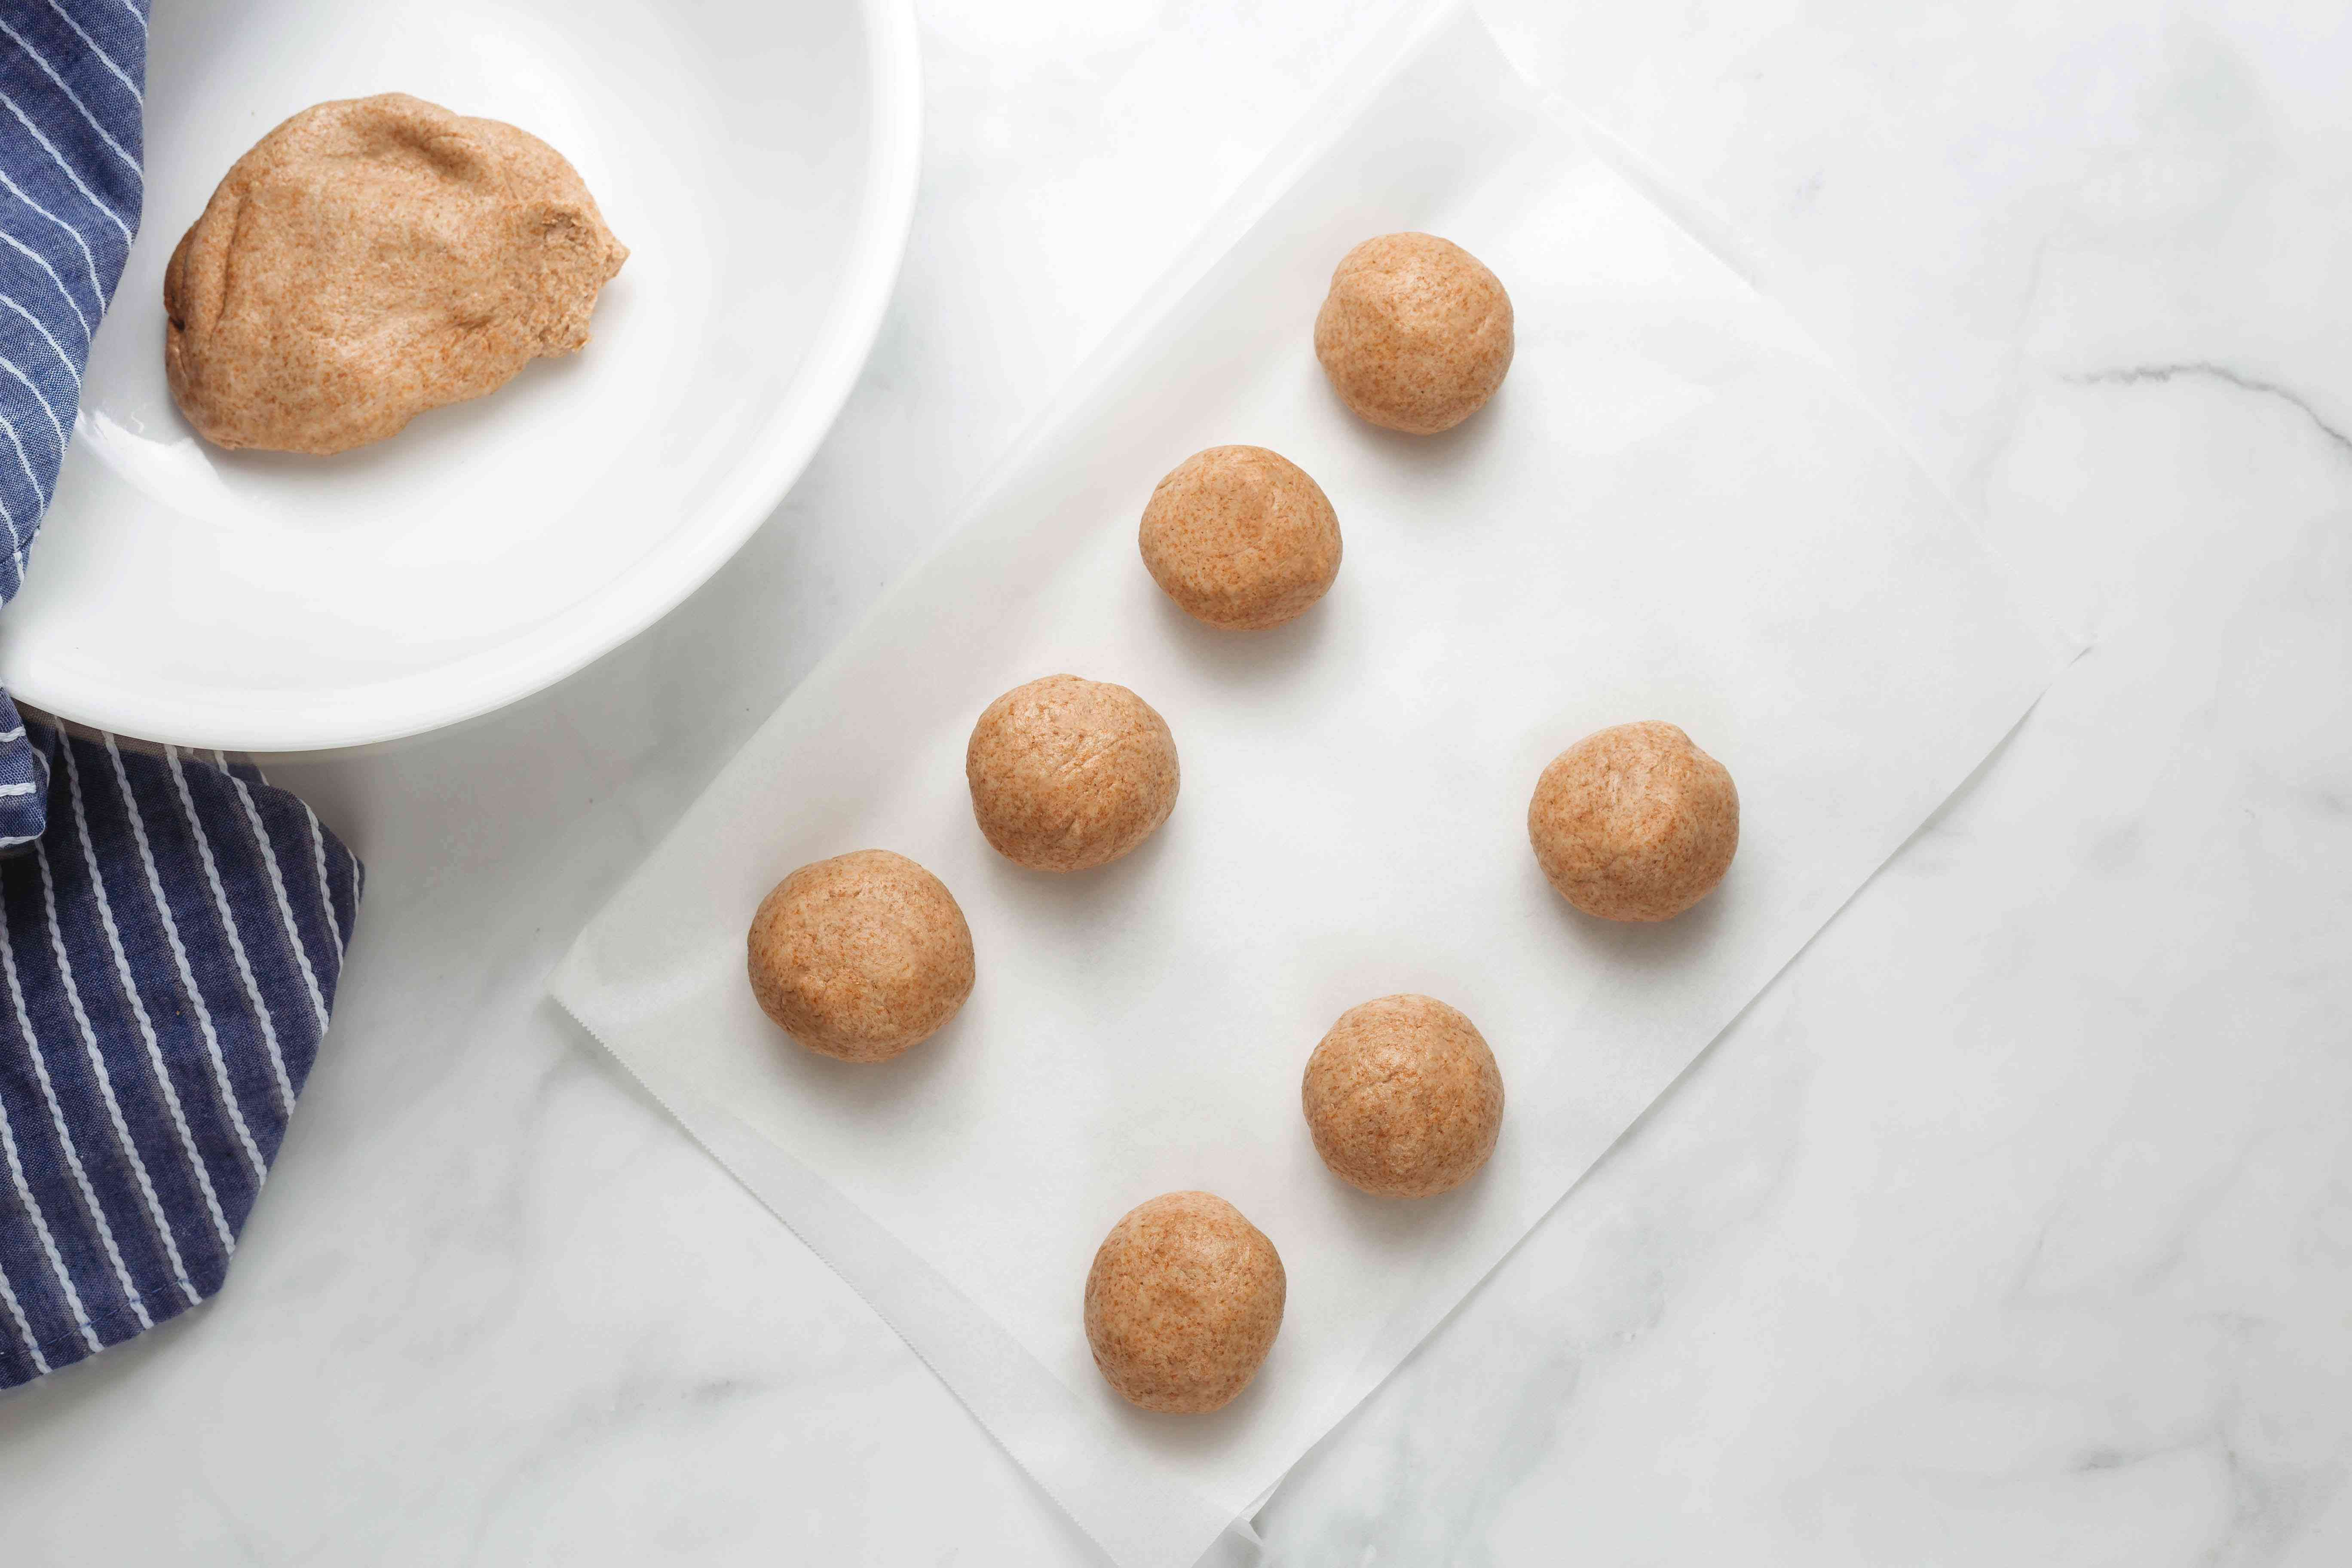 Wheat flour dough balls